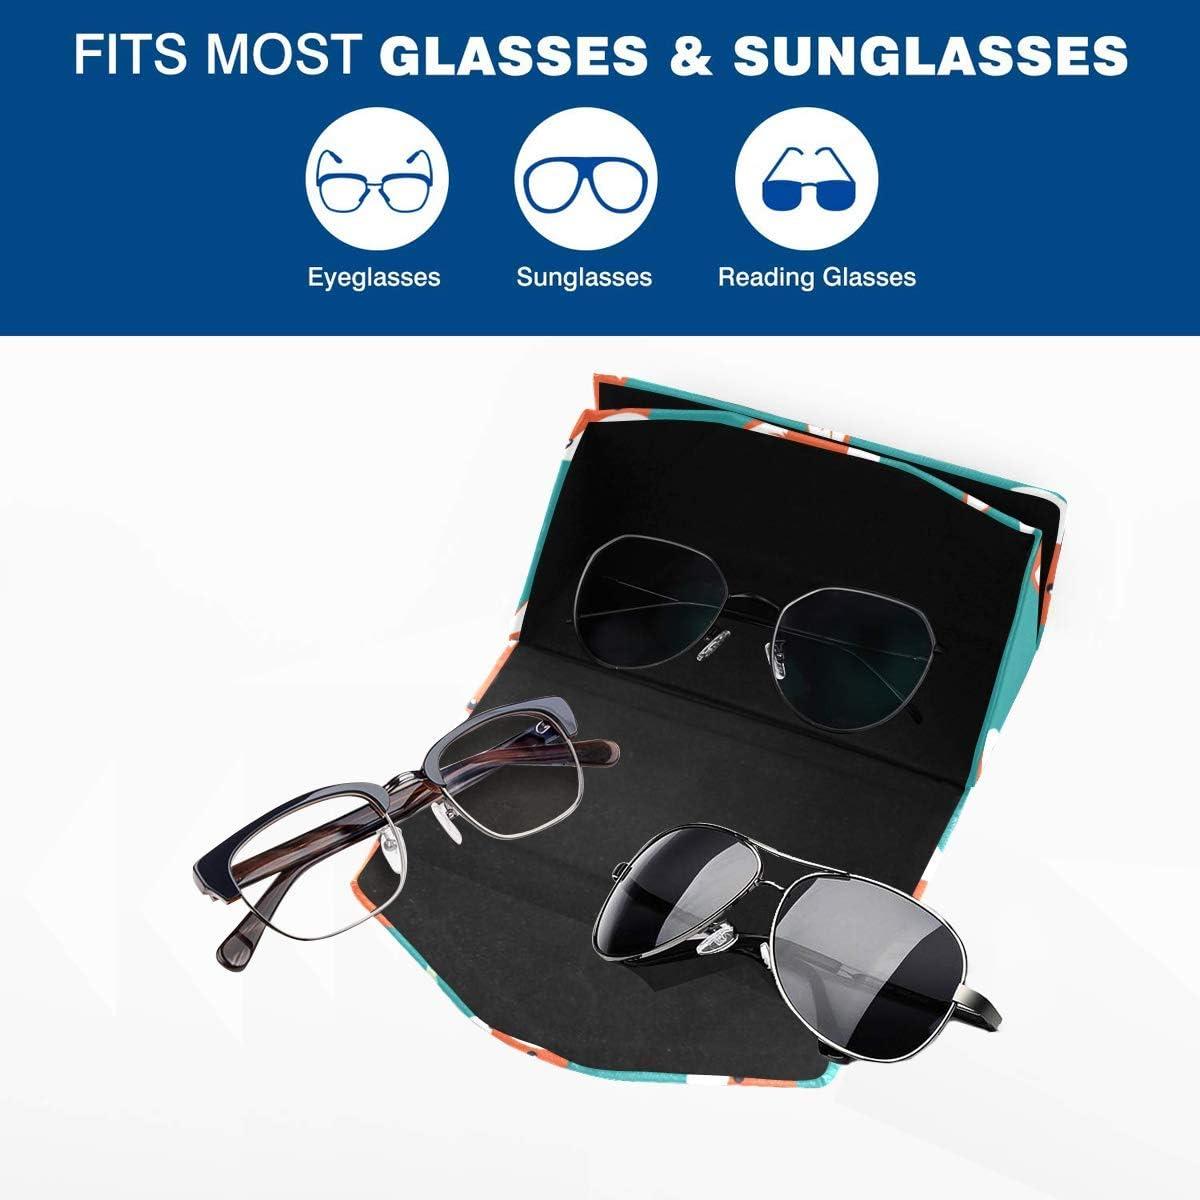 Glasses Case Cute Foxes Faces Eyeglass Case Leather Magnetic Folding Hard Case Sunglasses Eyewear Protective Case